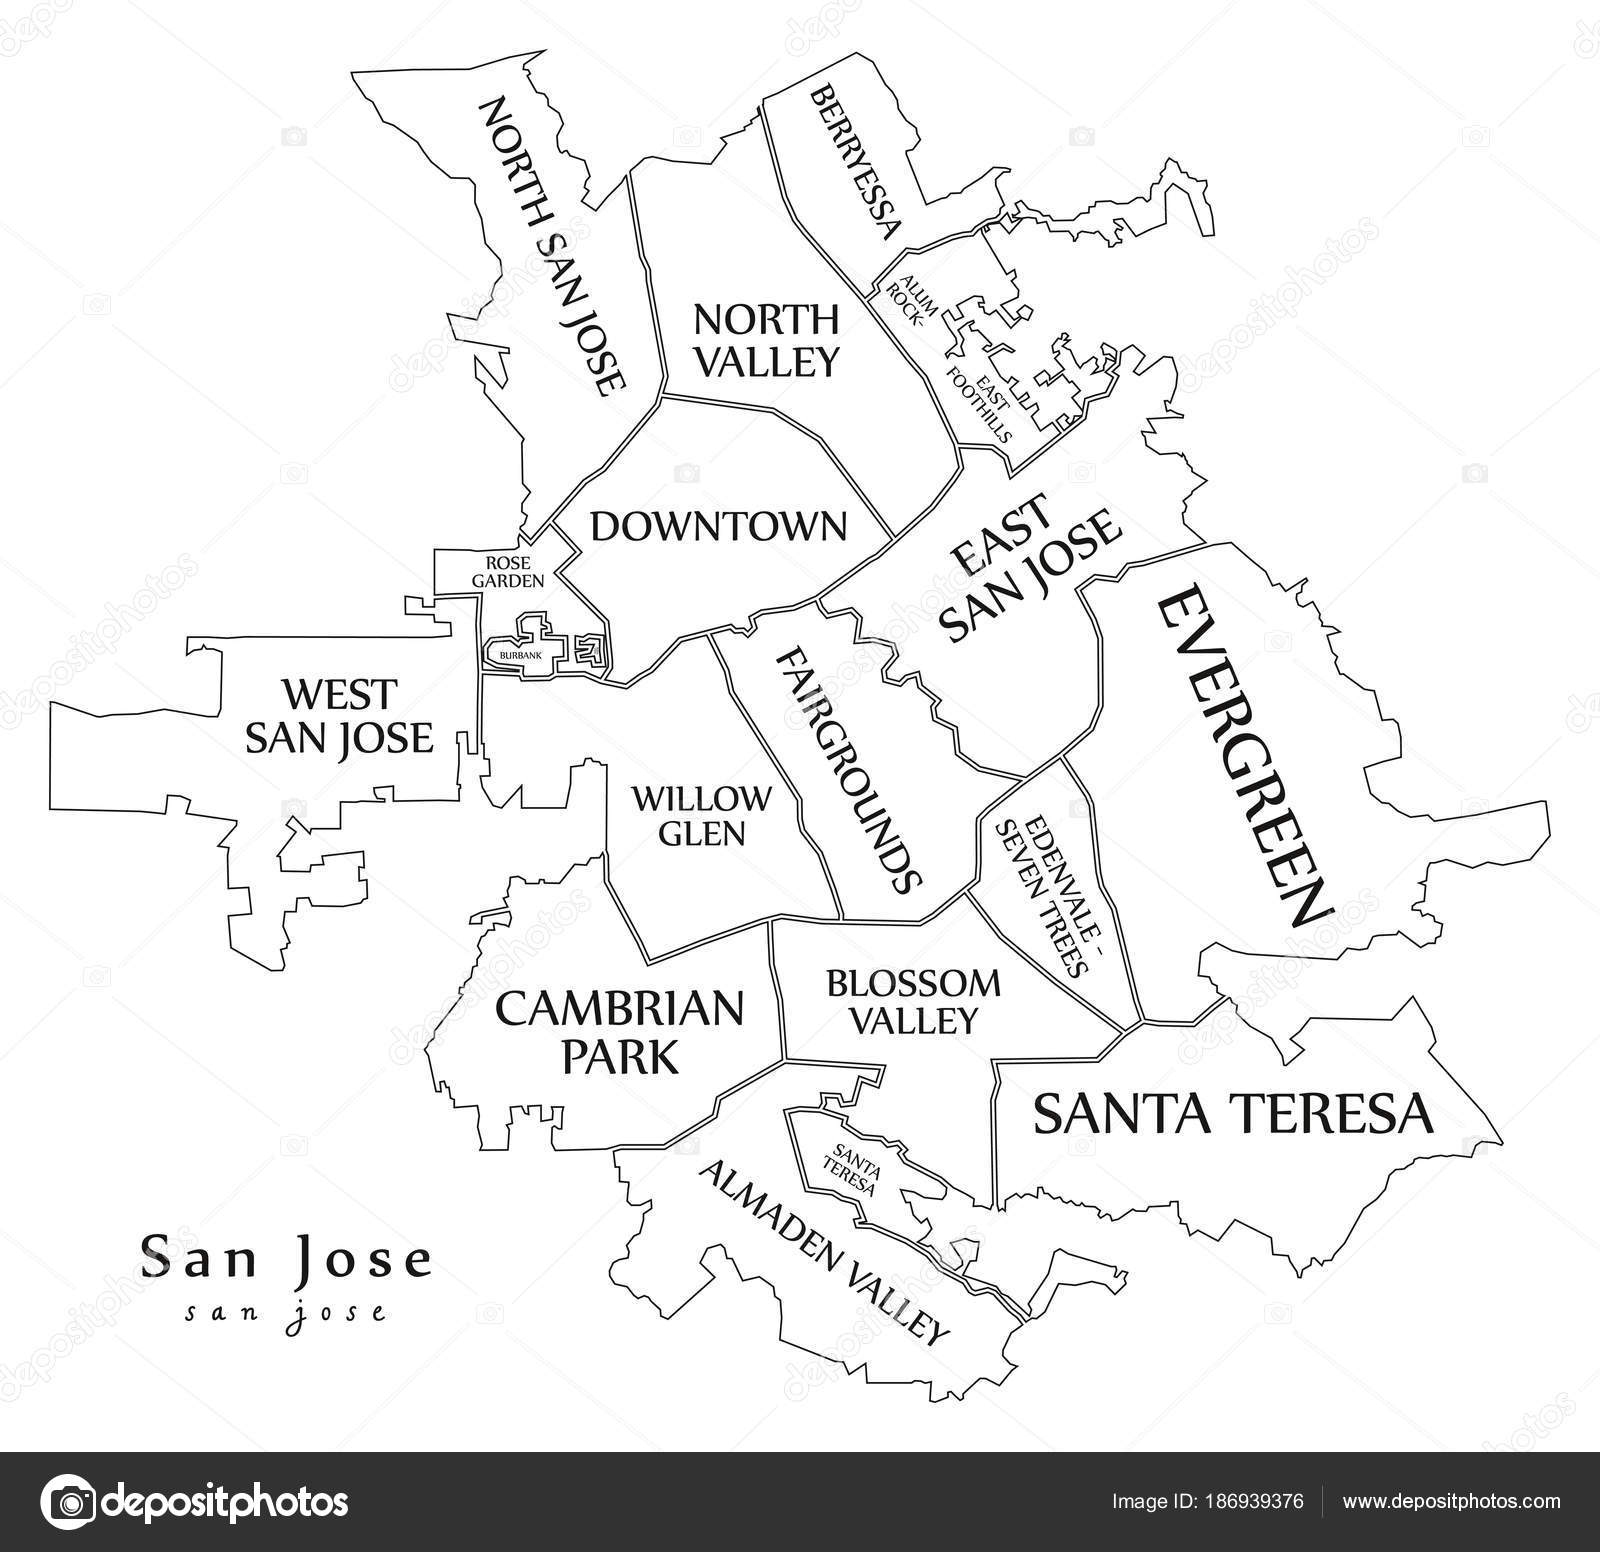 Modern City Map - San Jose city of the USA with neighborhoods an ...